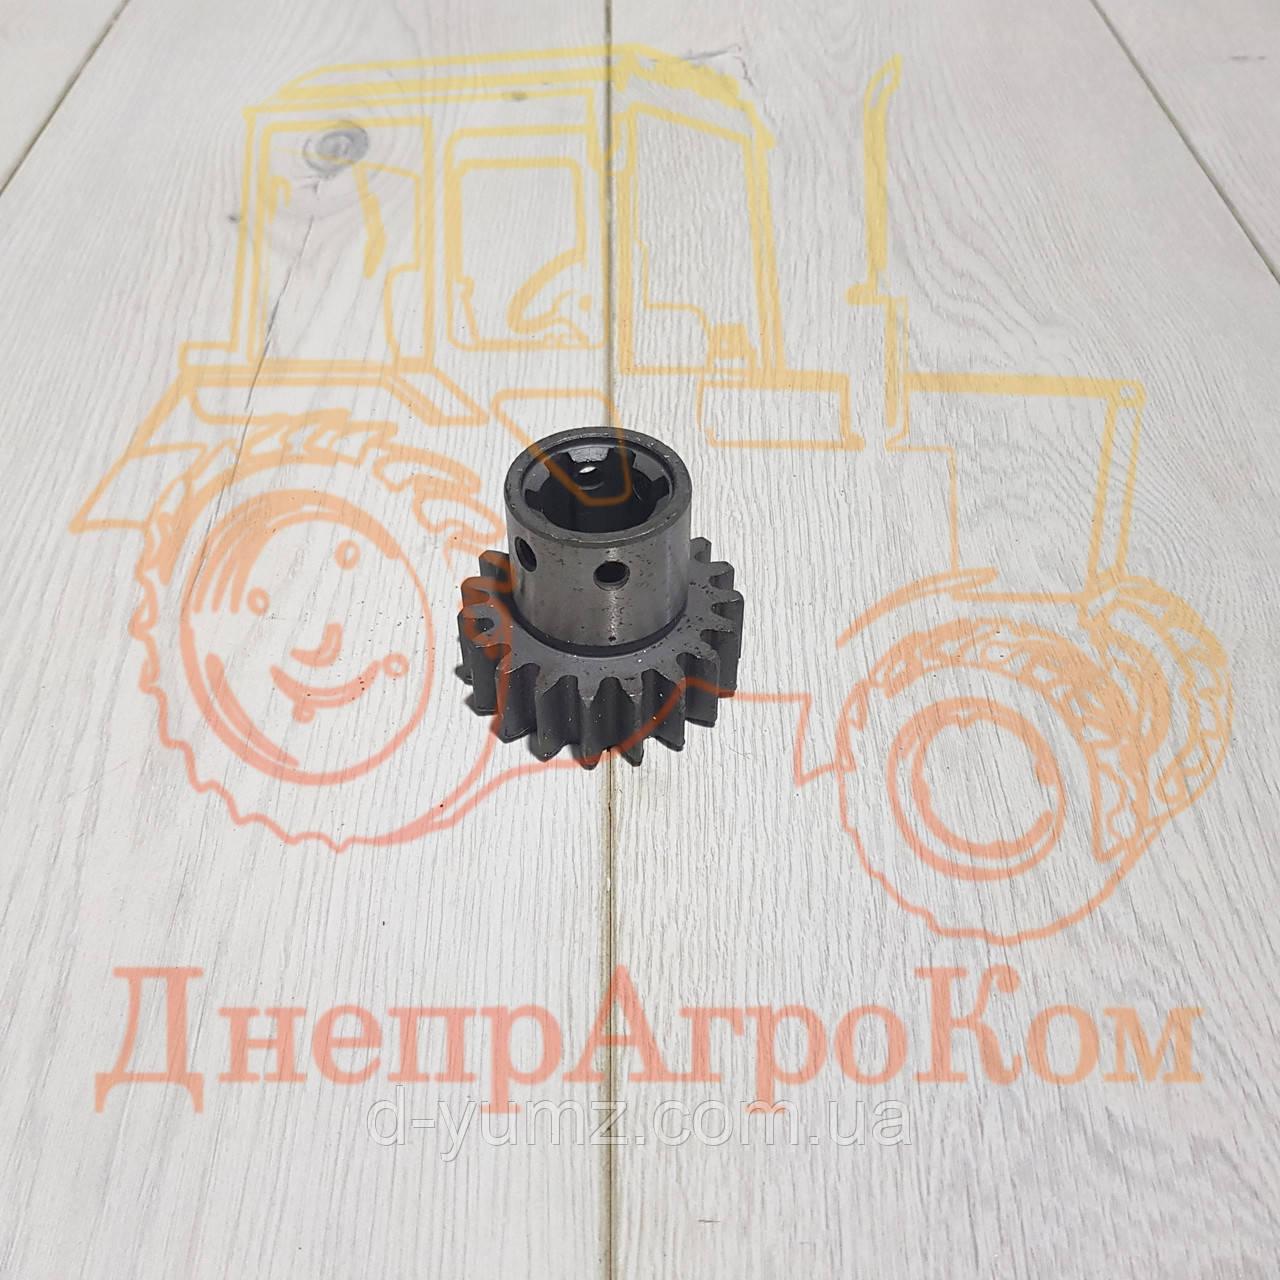 Шестерня стартера ЮМЗ Д-65   Z=19   Д25-051